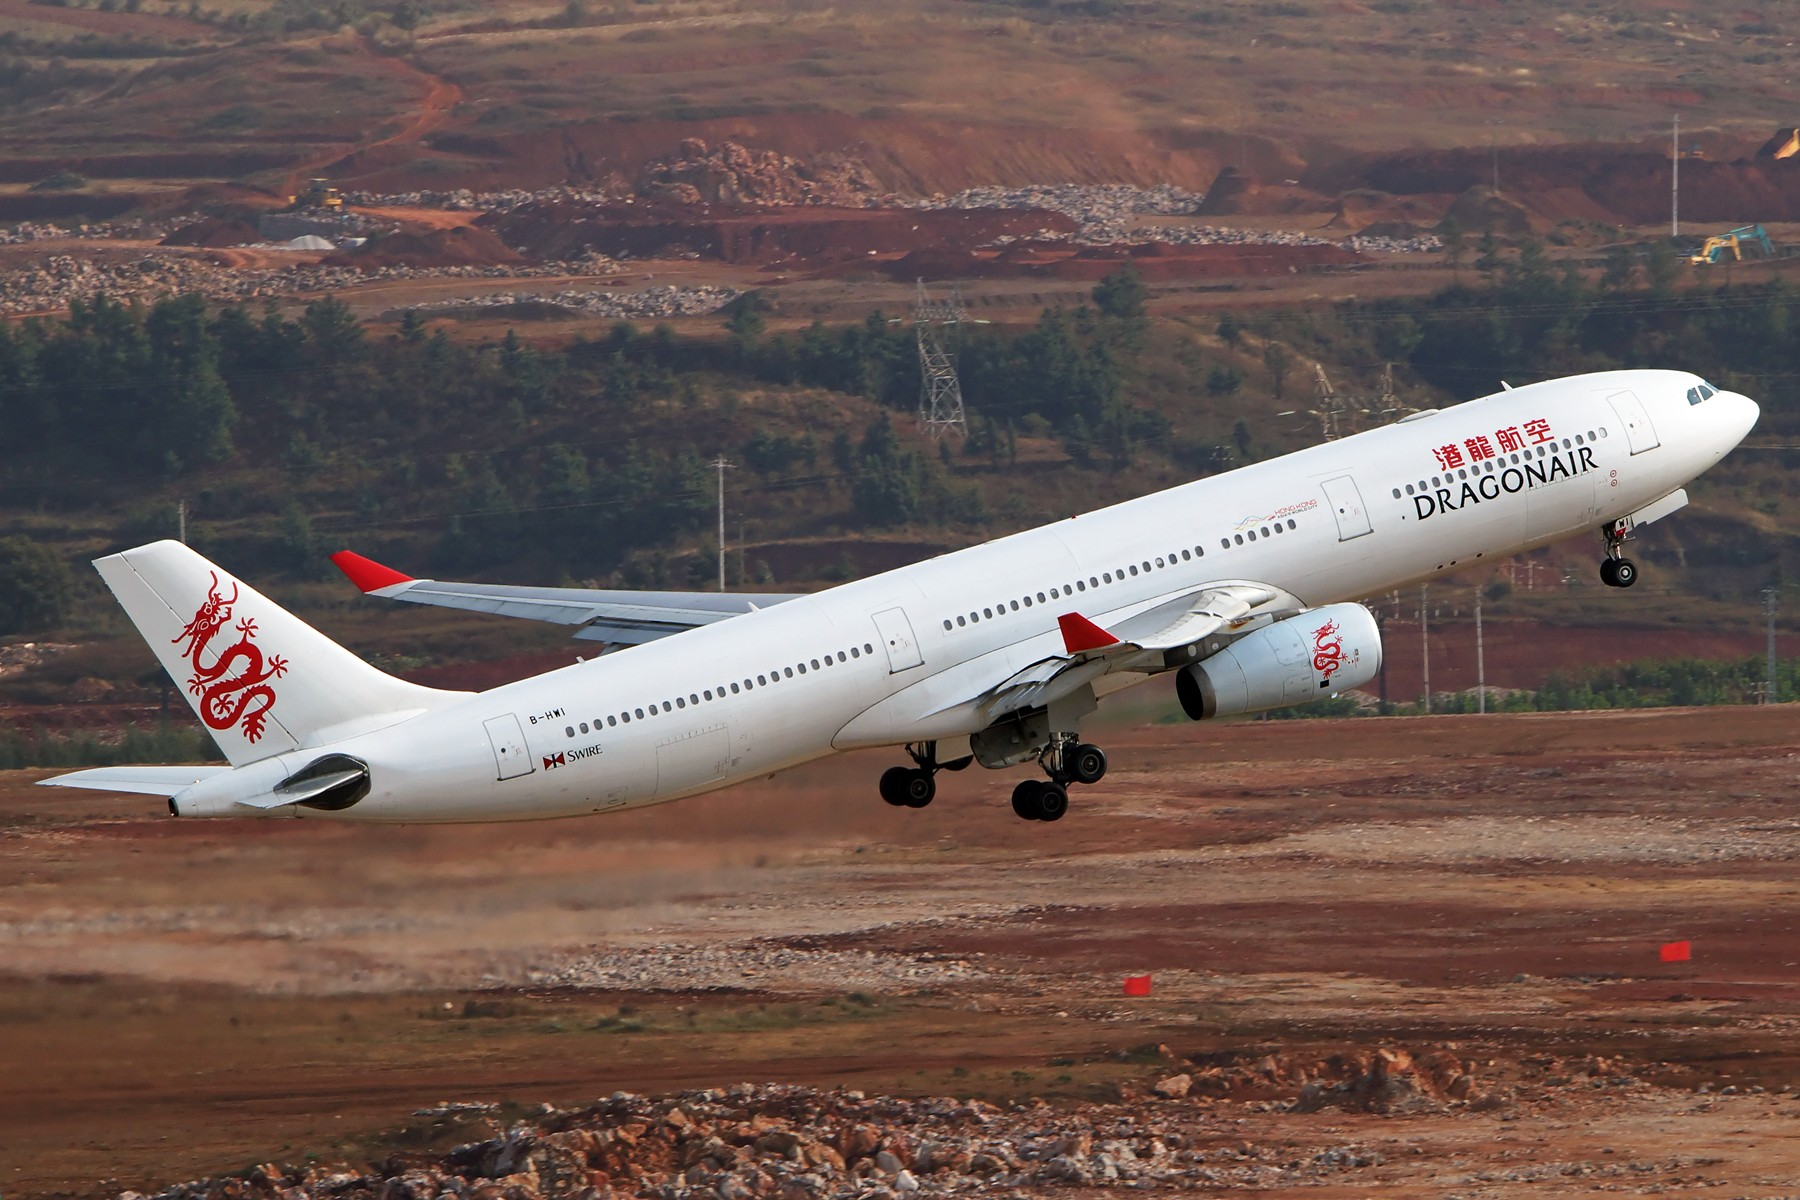 Re:[原创][Andrei] ------- 素颜也美丽,港龙330篇 AIRBUS A330-300 B-HWI 中国昆明长水机场